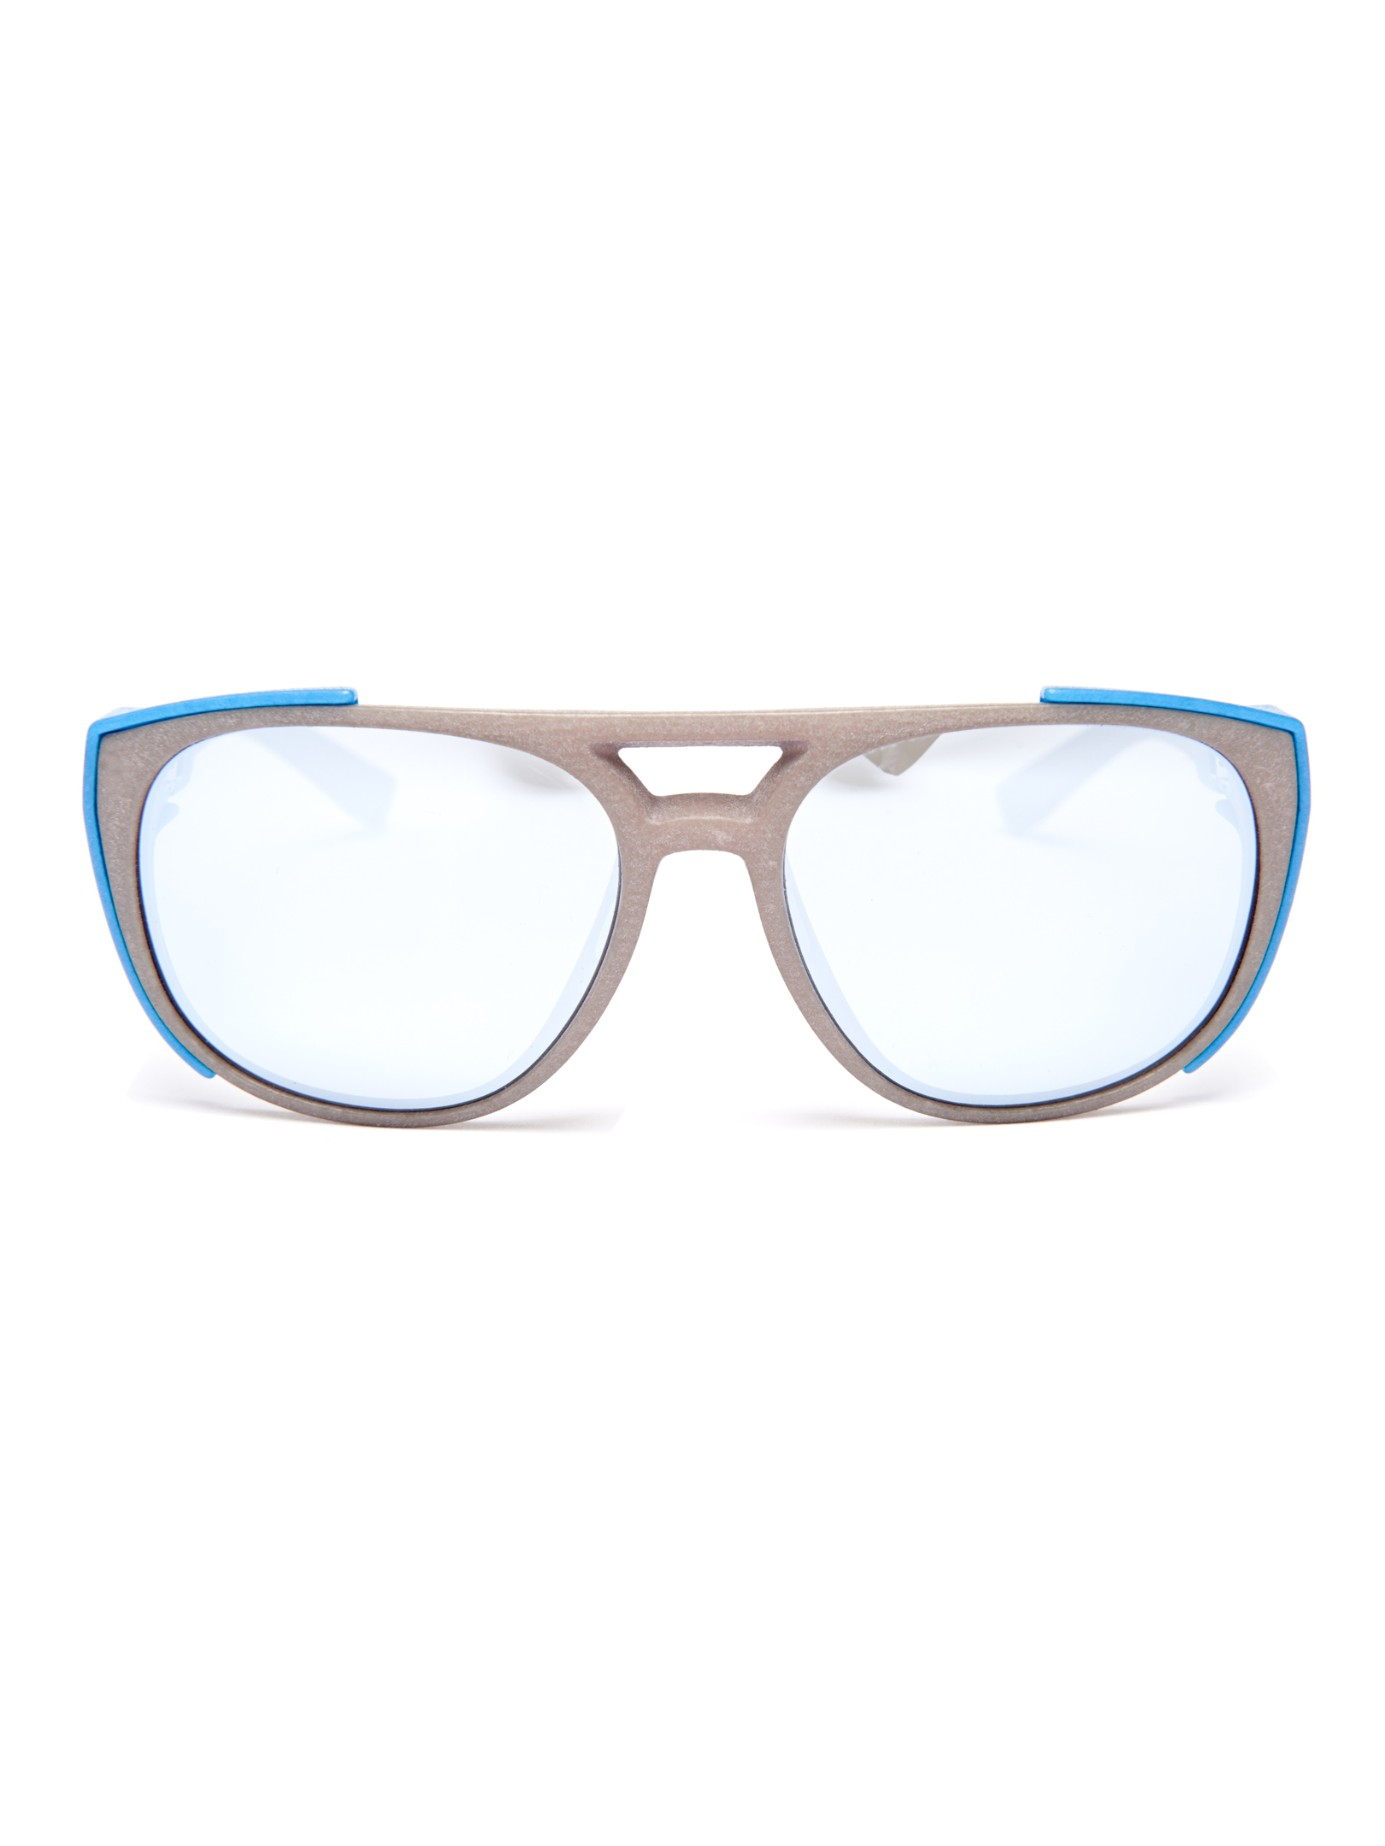 a251edc39dc Aviator Style Clip On Sunglasses For Men